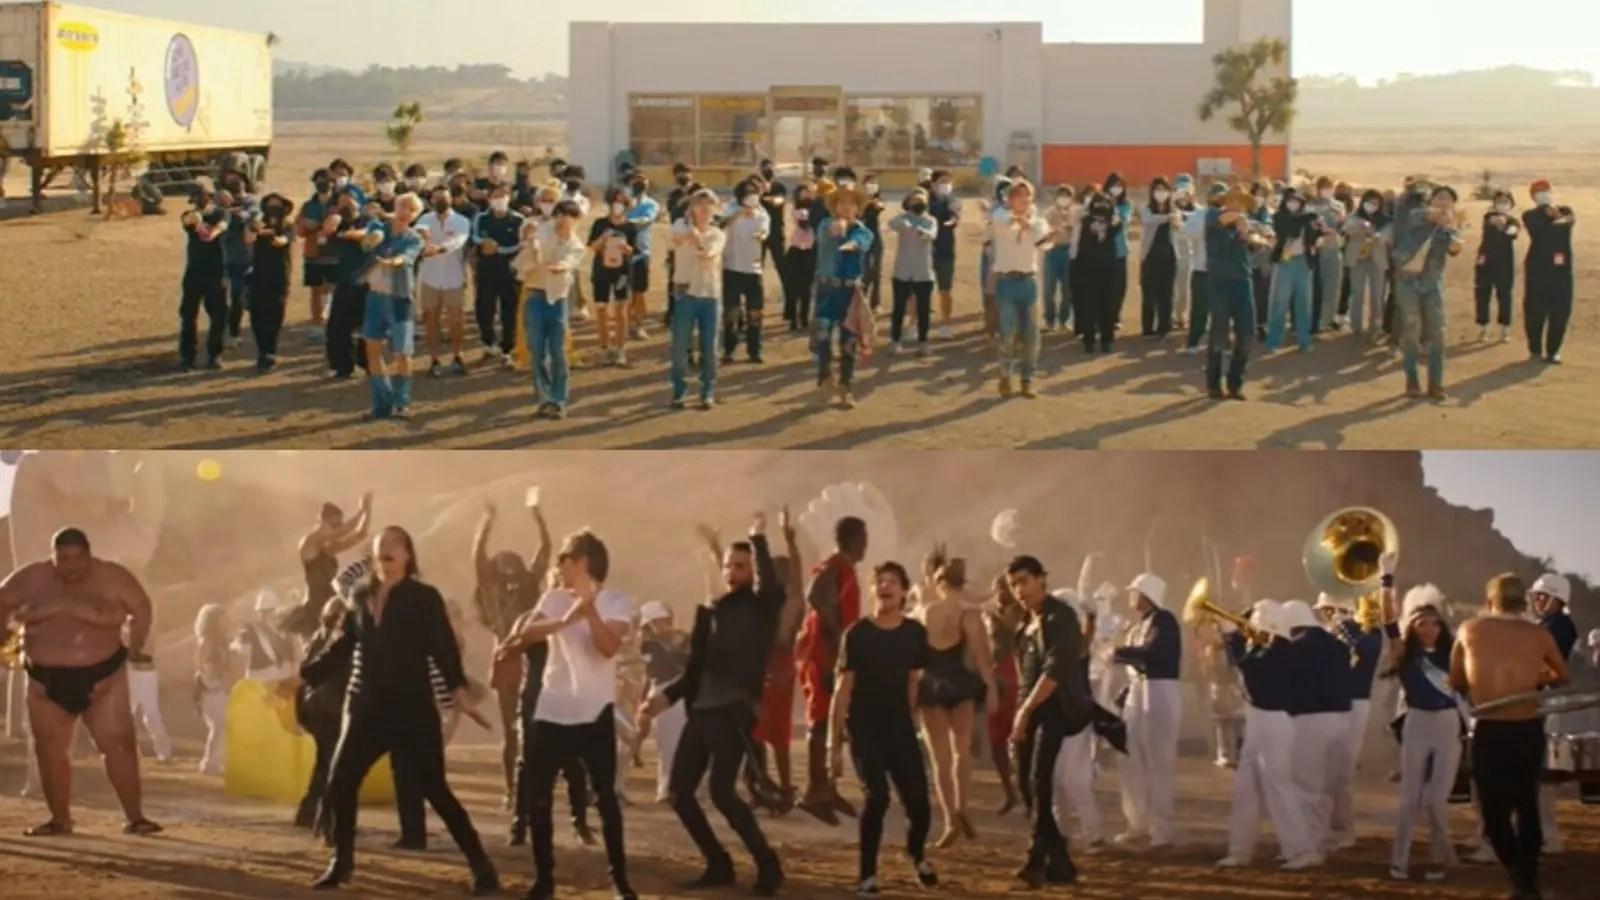 Permission To Dance Wallpaper  20s20fl20ygvnkx20m / Bts members ...